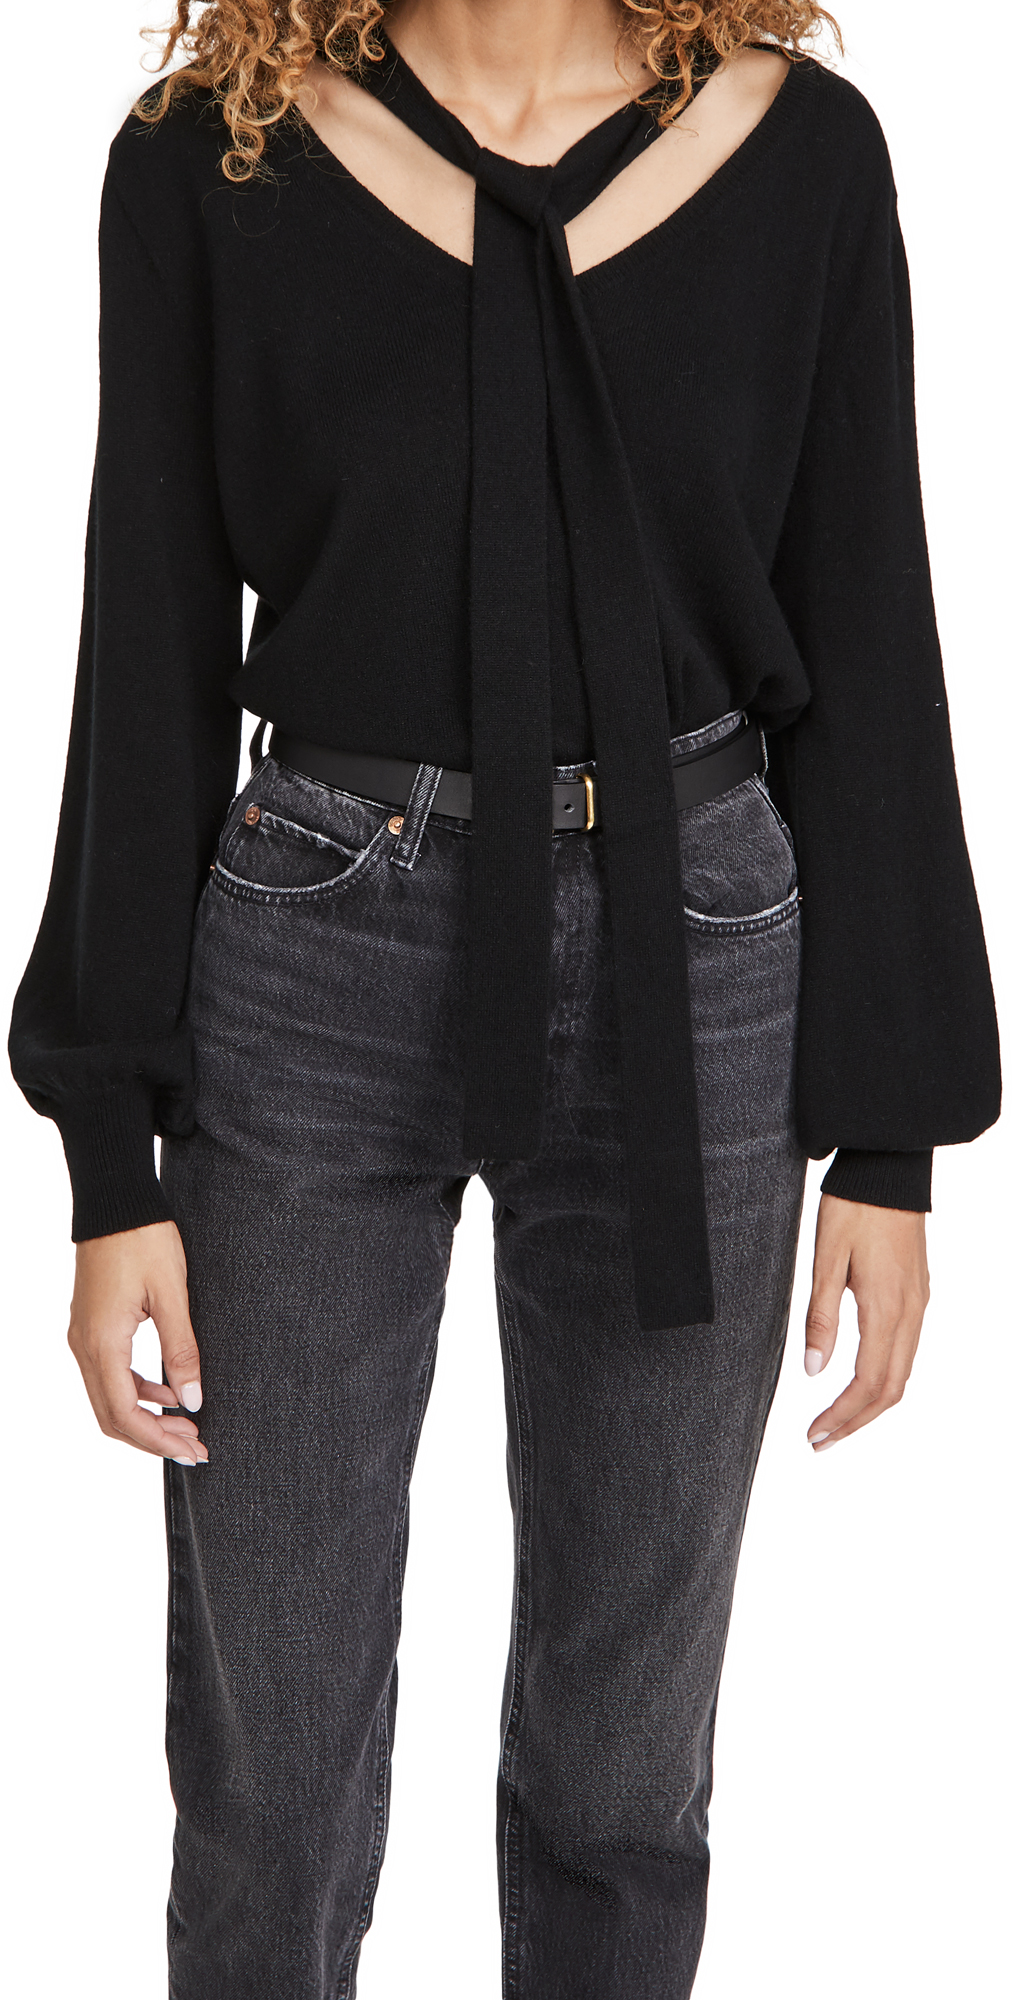 Nili Lotan Shaelyn Cashmere Sweater